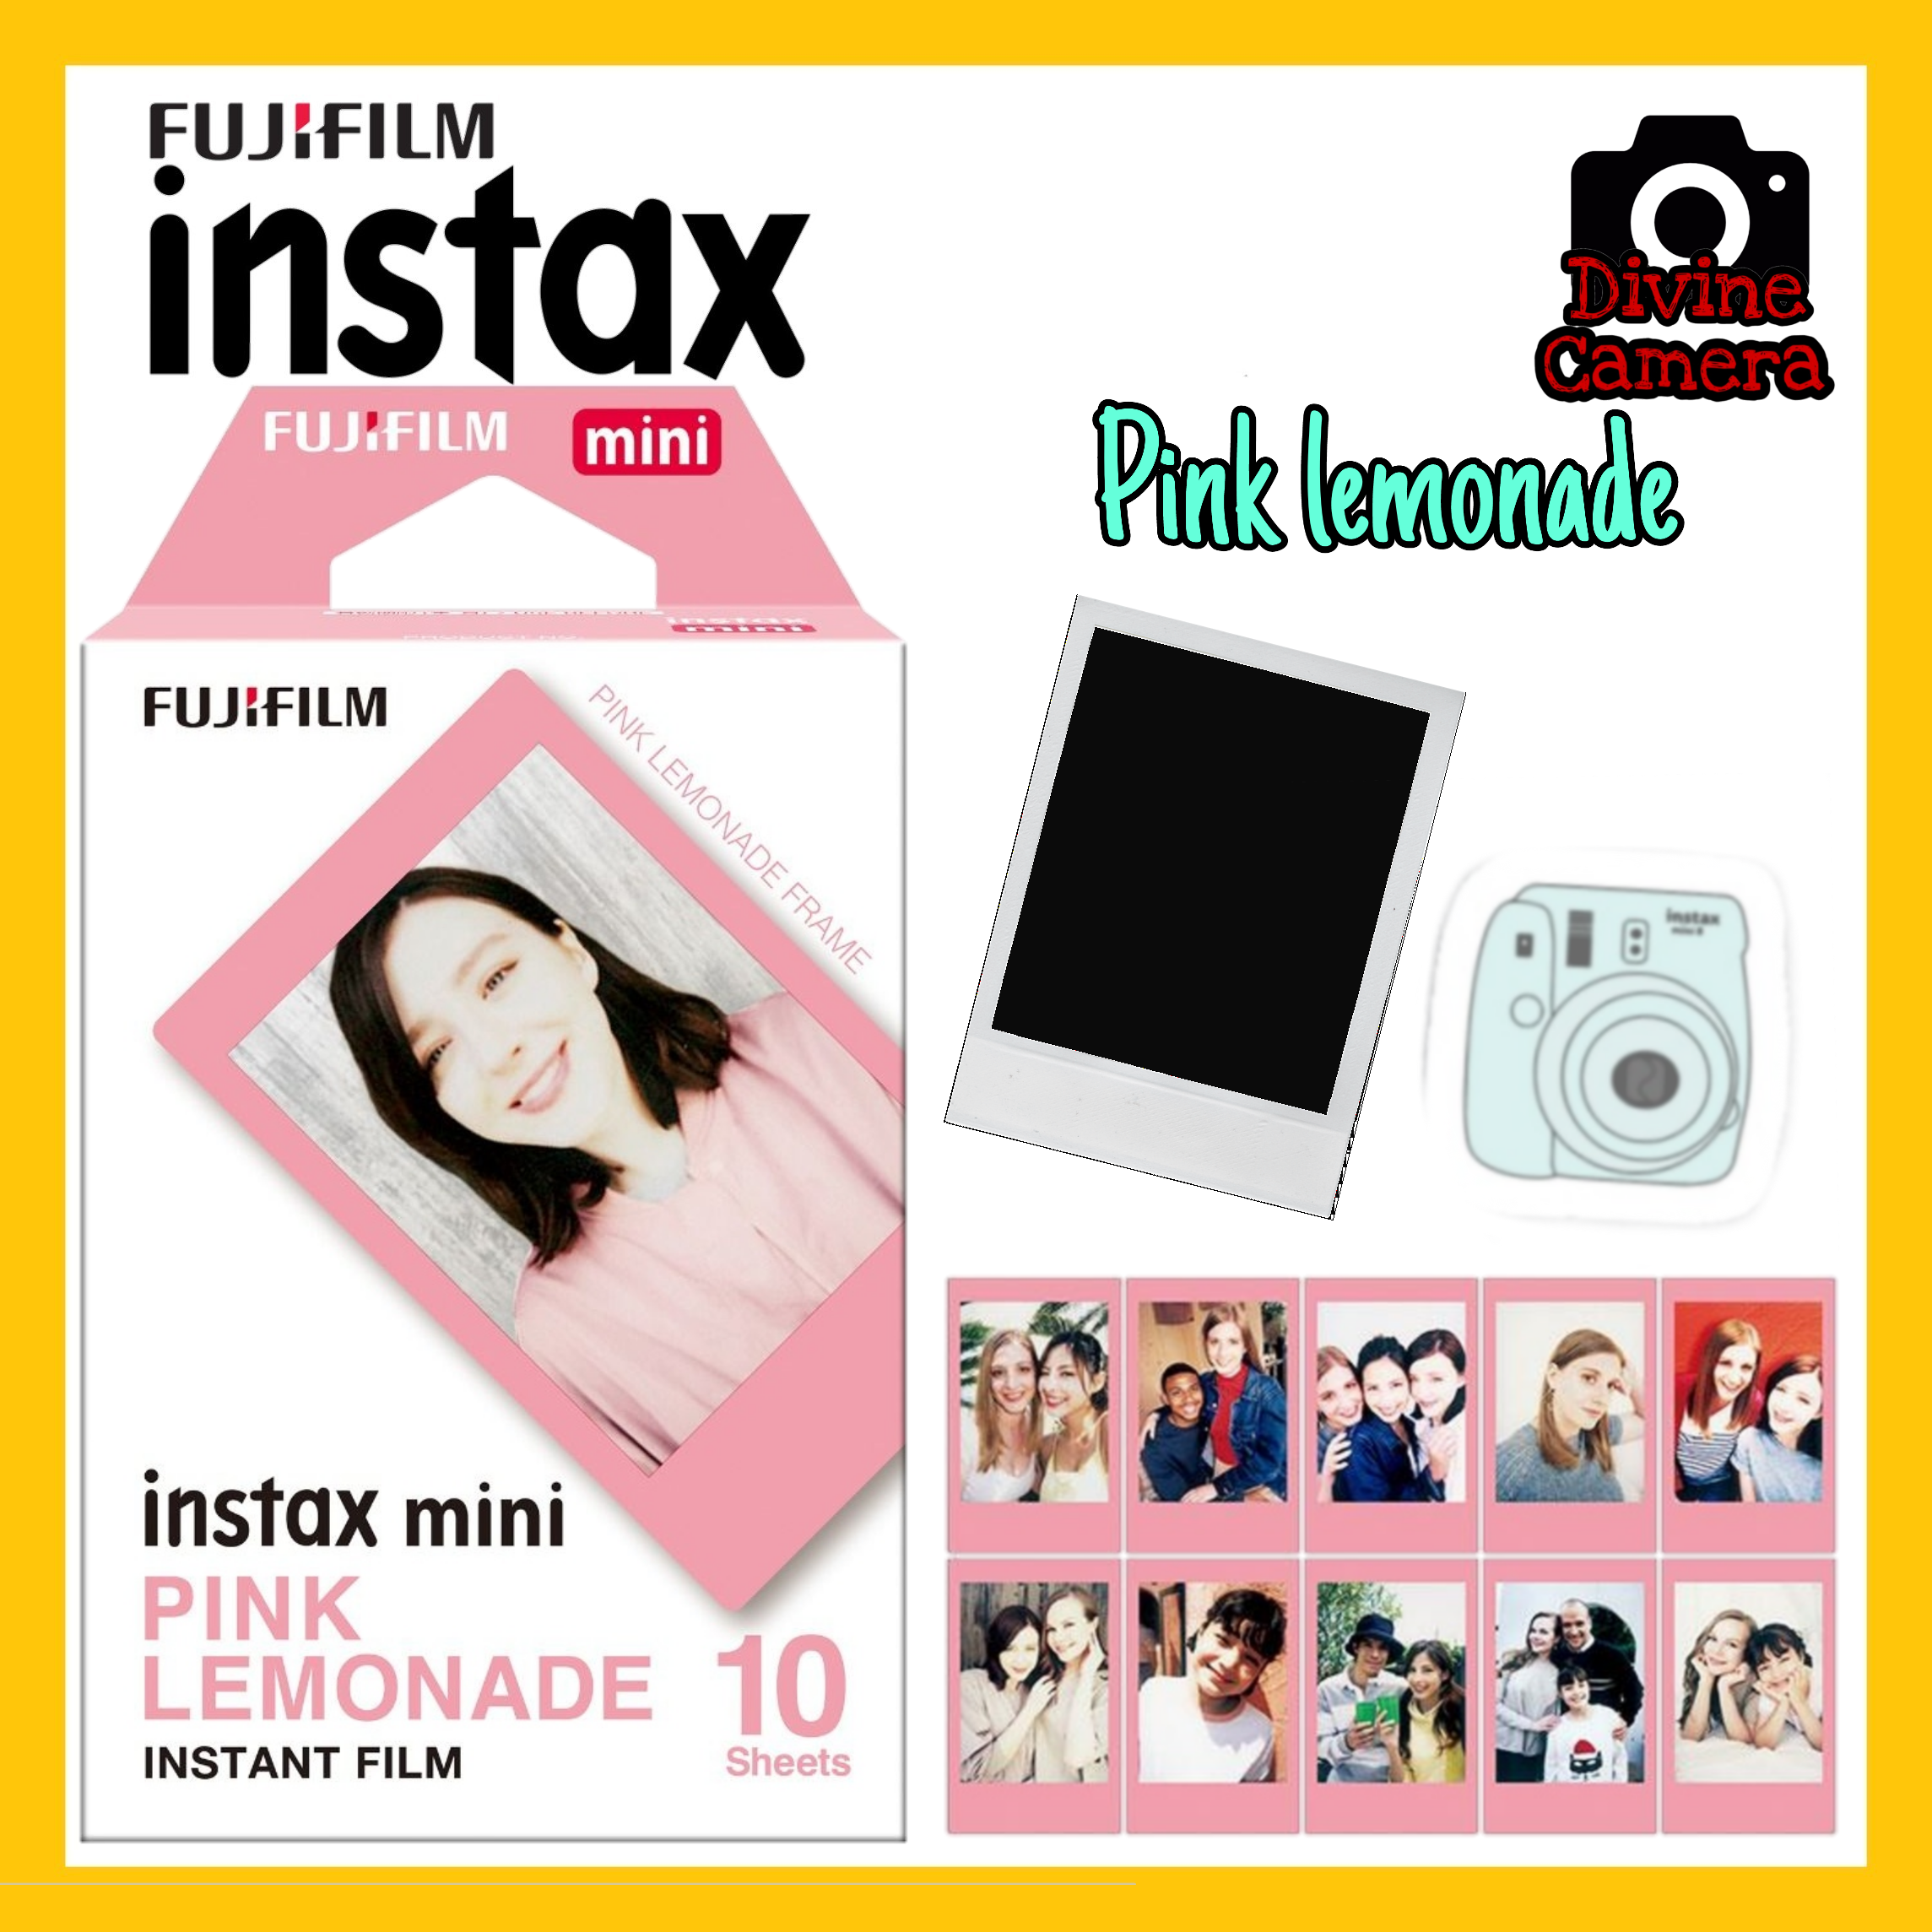 FUJIFILM INSTAX Mini Pink Lemonade Instant Film (10 Sheets)